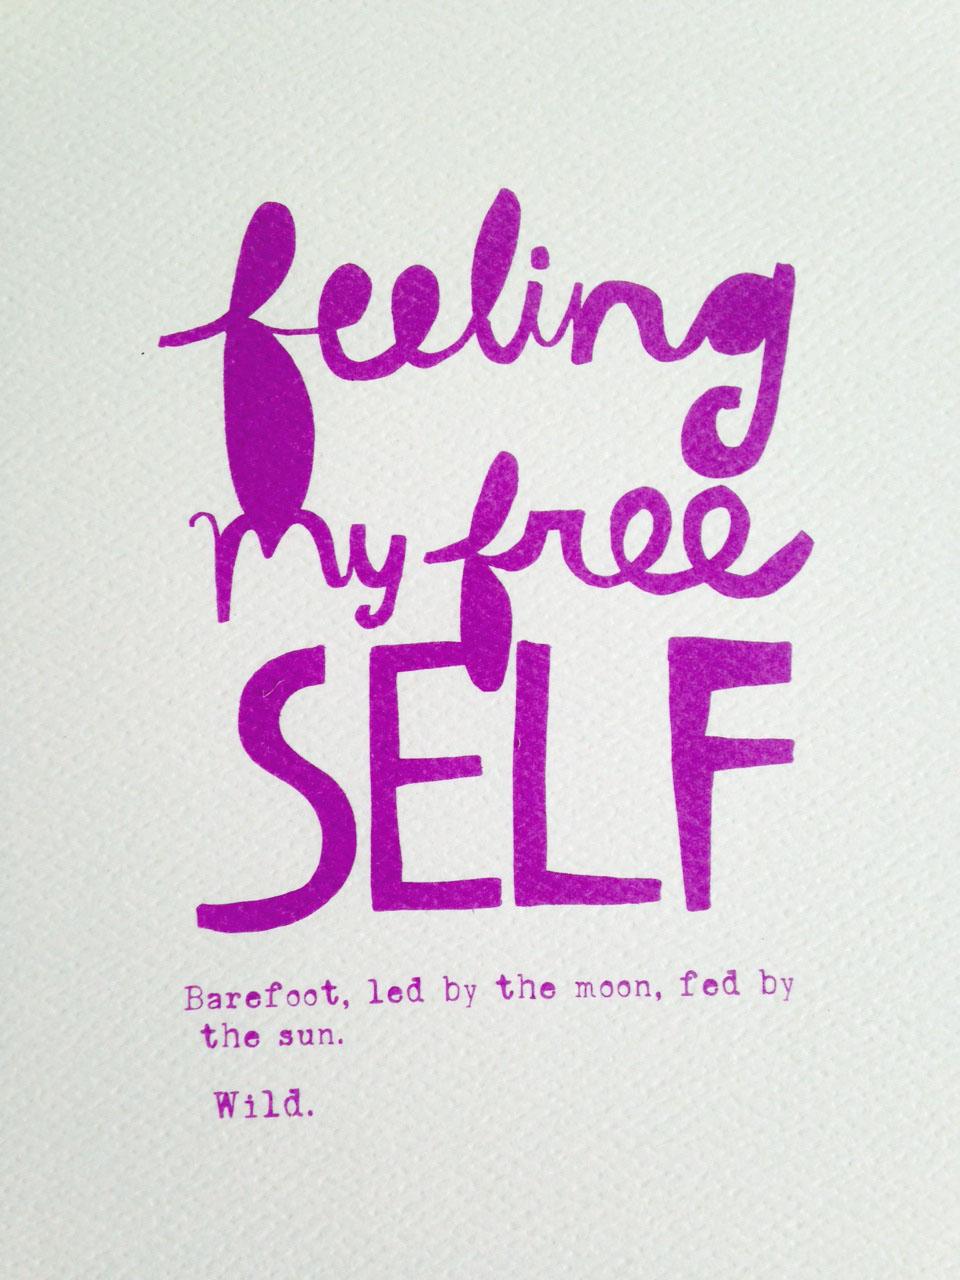 feeling free_image.jpg